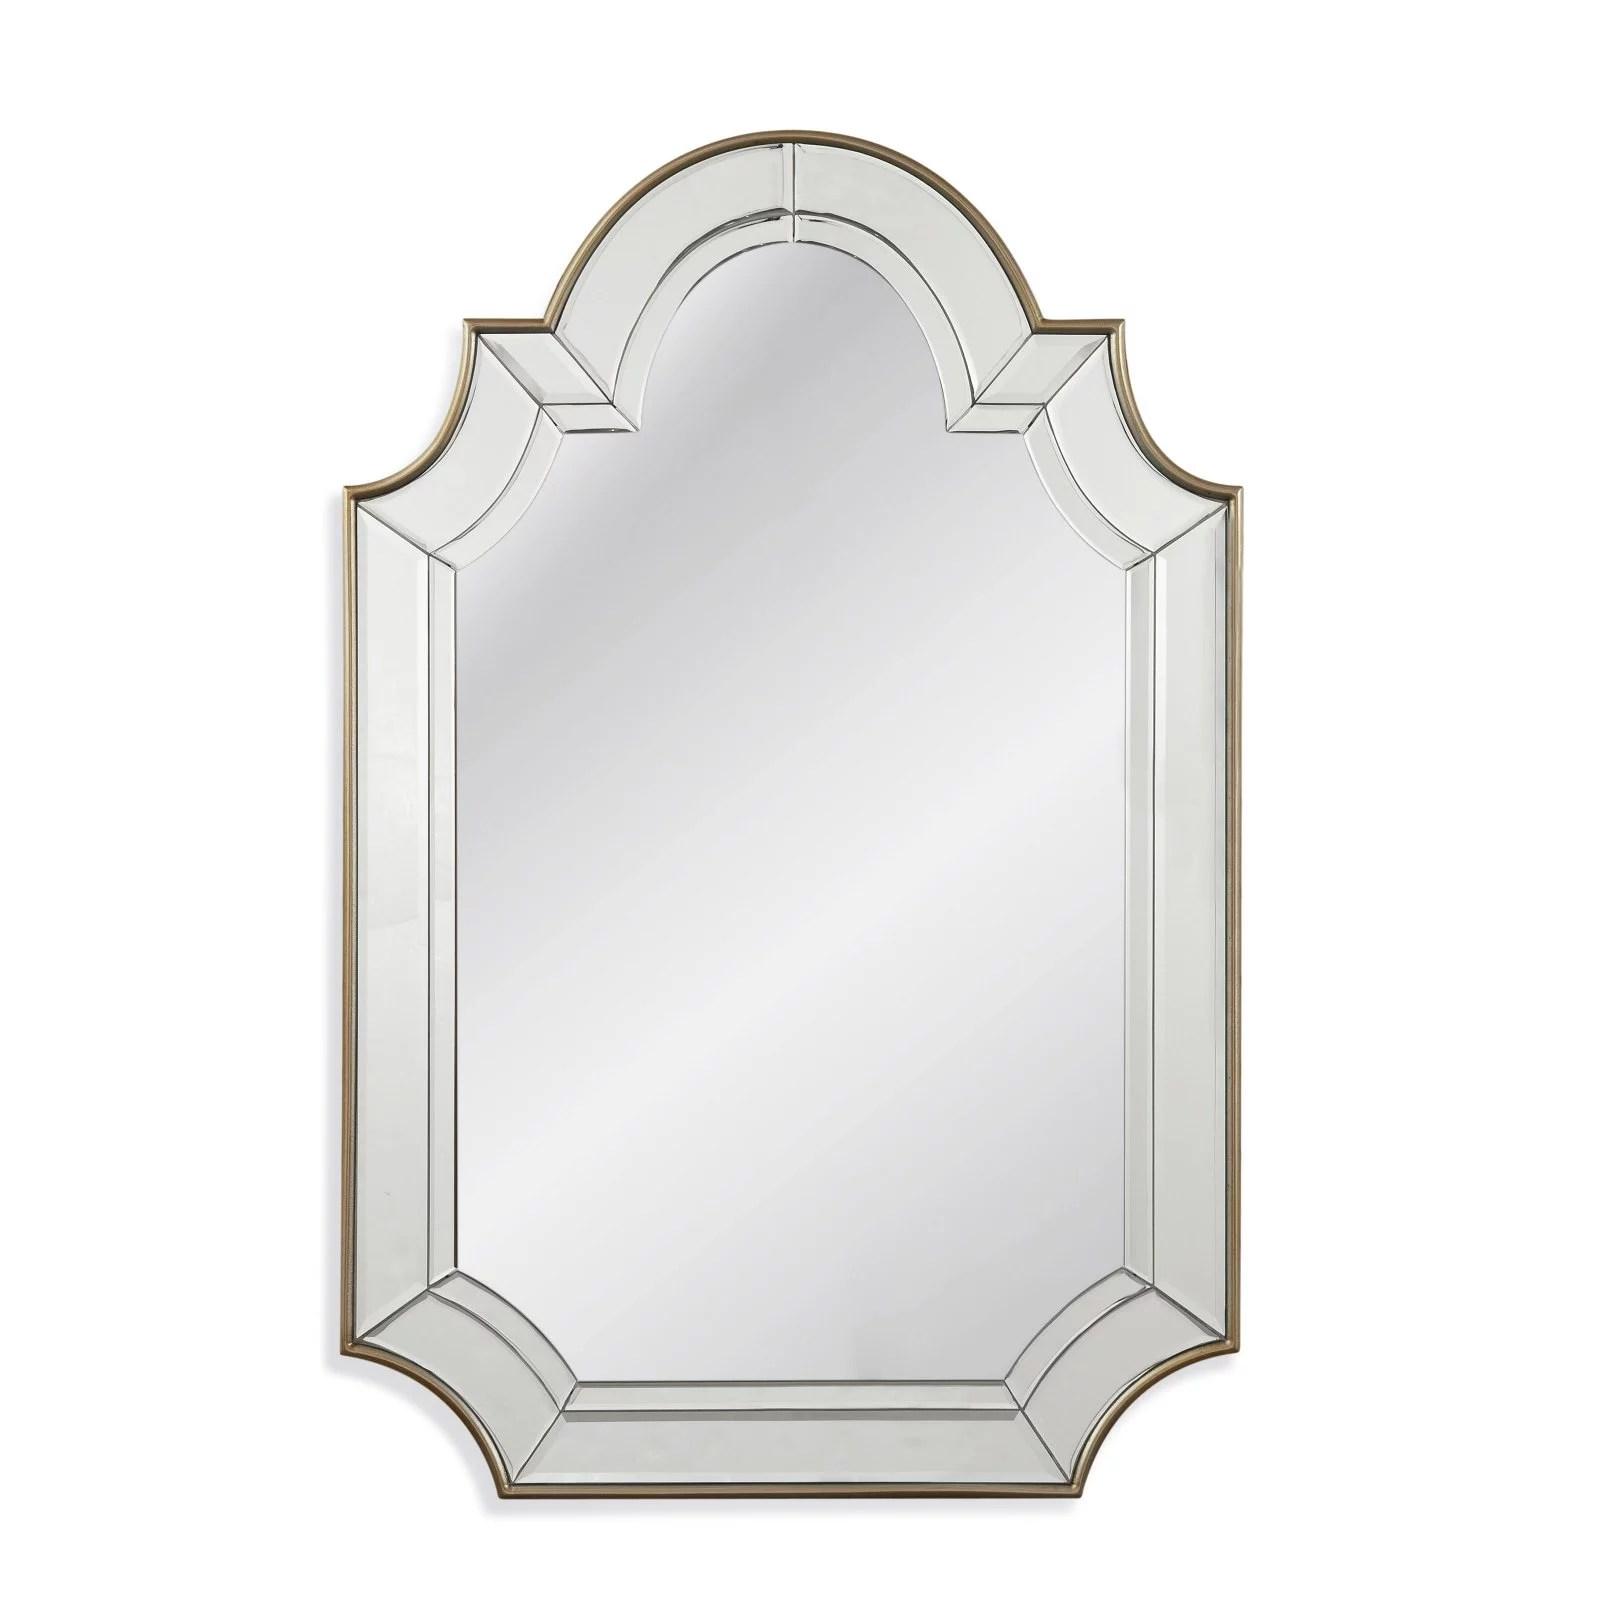 bassett mirror phaedra wall mirror 30w x 46h in walmart com